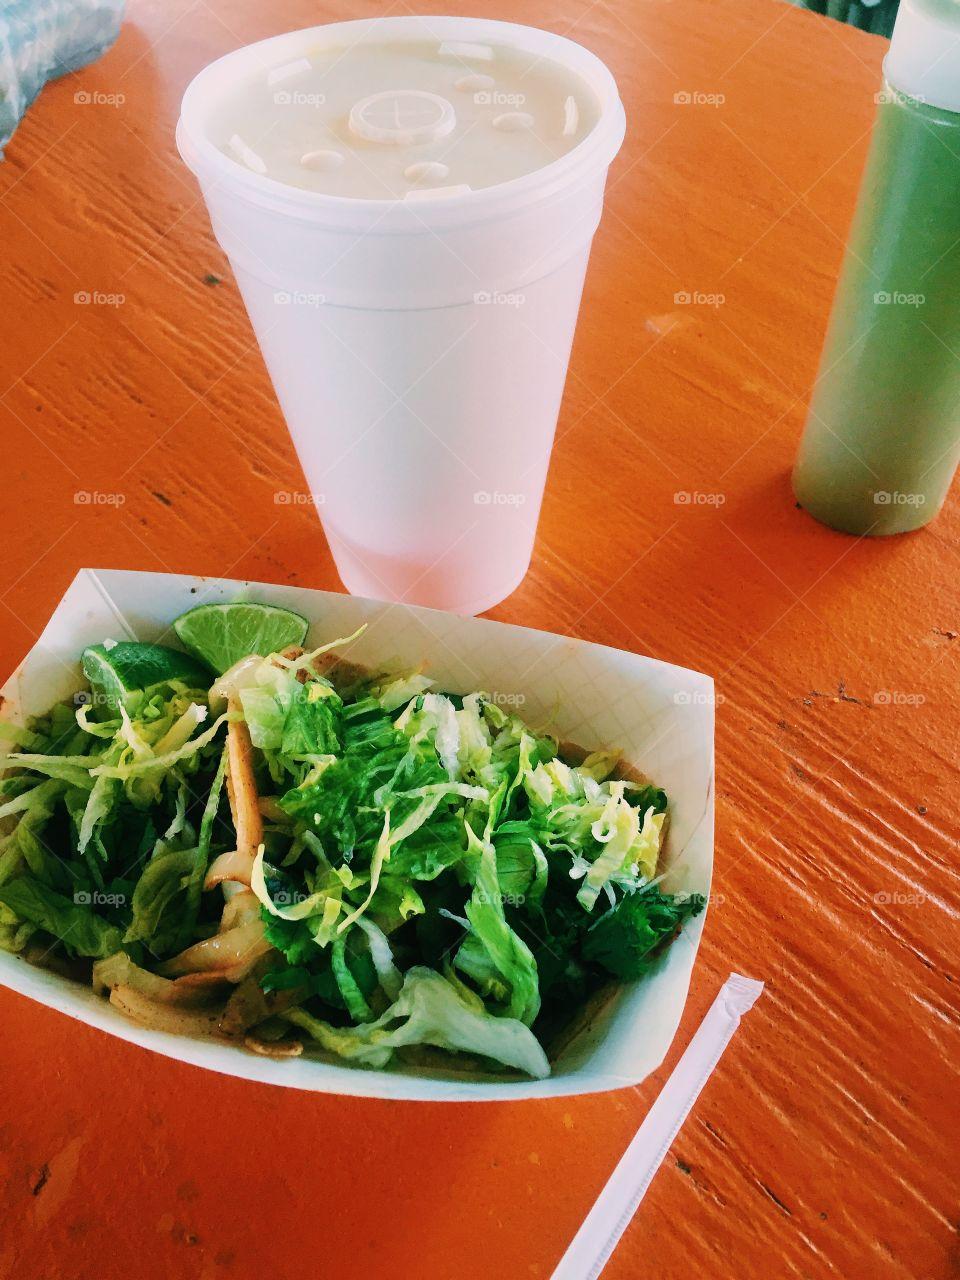 Food, Health, Nutrition, Leaf, No Person